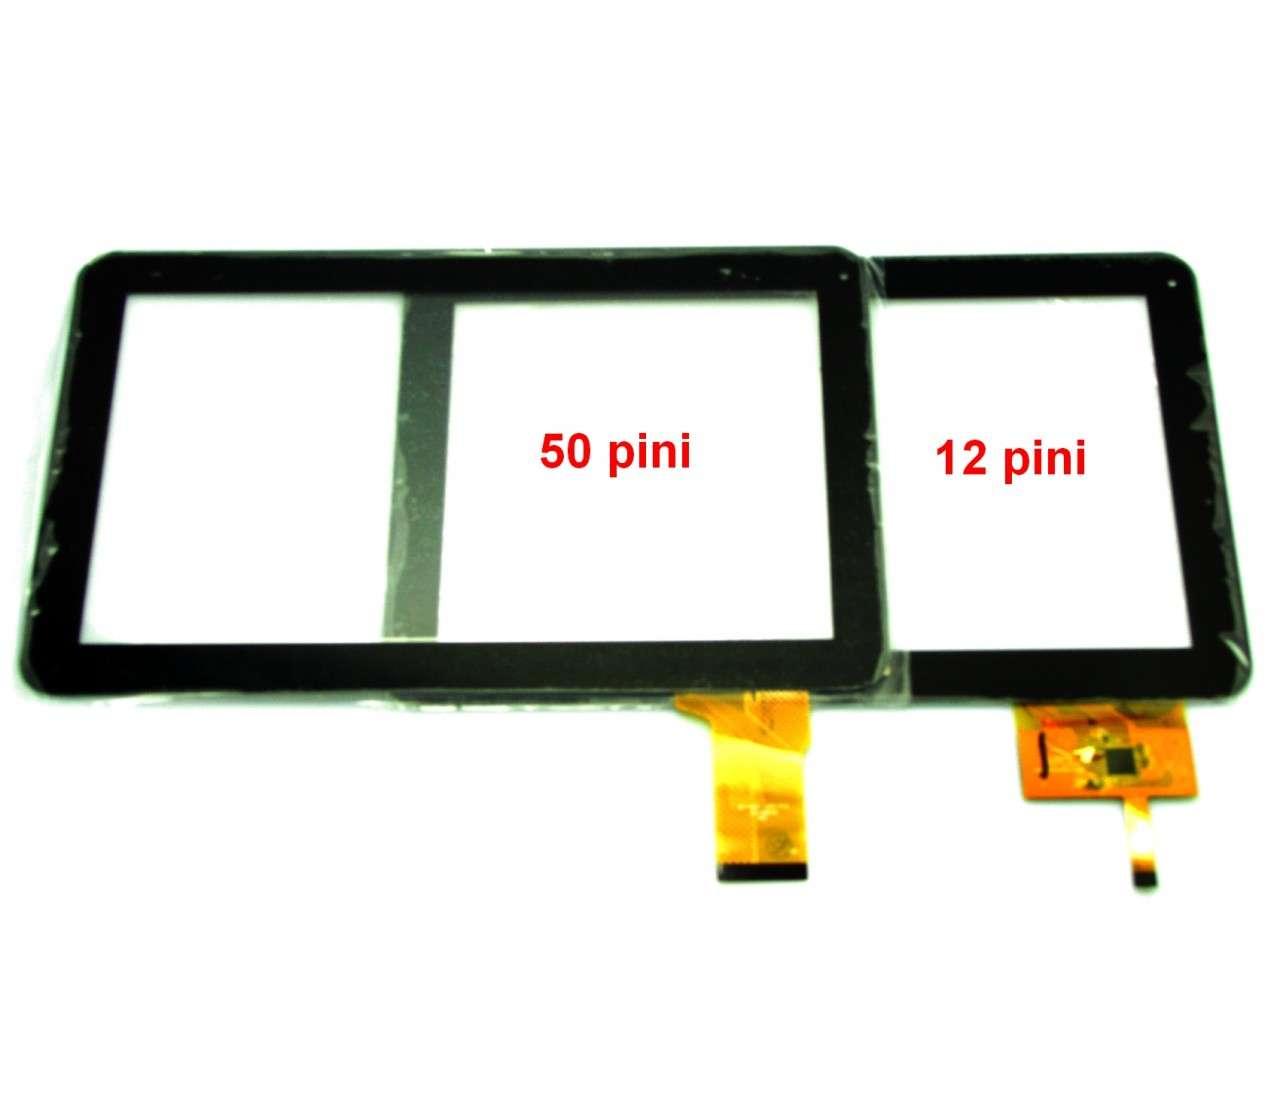 Touchscreen Digitizer Polaroid MIDC410PR003 50 pini Geam Sticla Tableta imagine powerlaptop.ro 2021